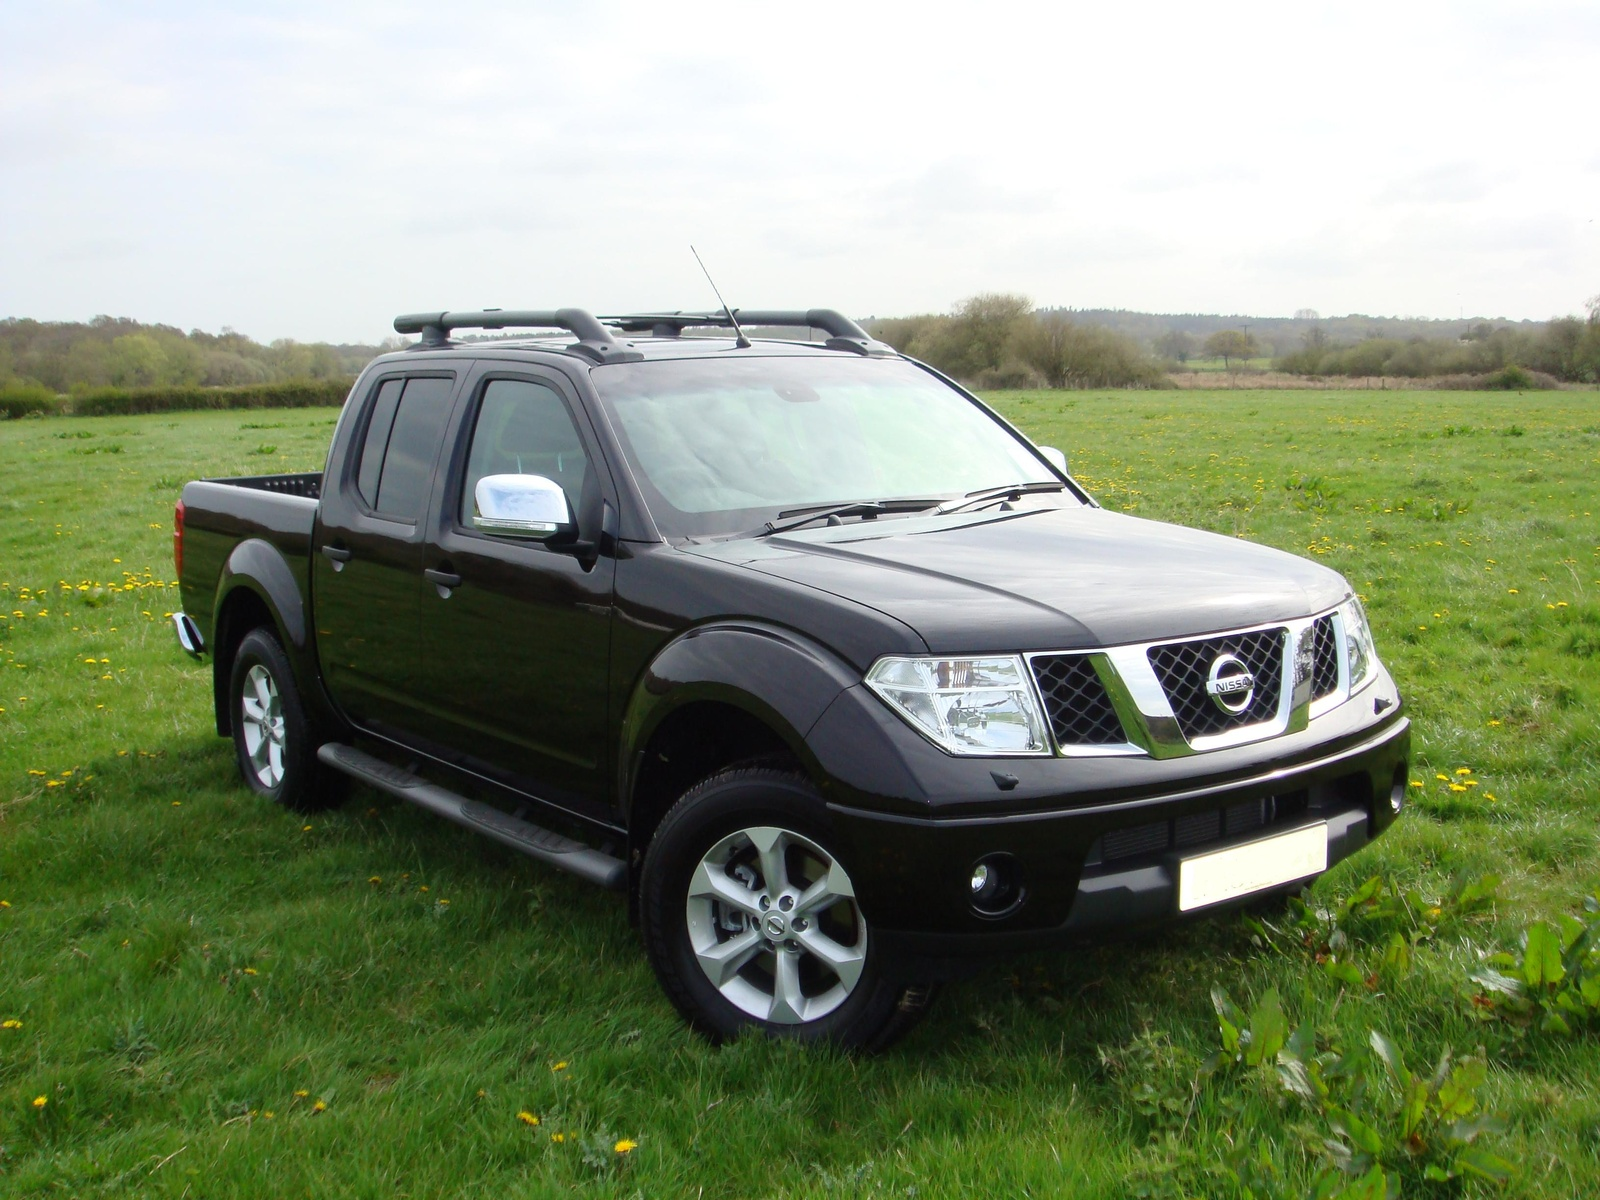 2007 Nissan Frontier Pictures Cargurus